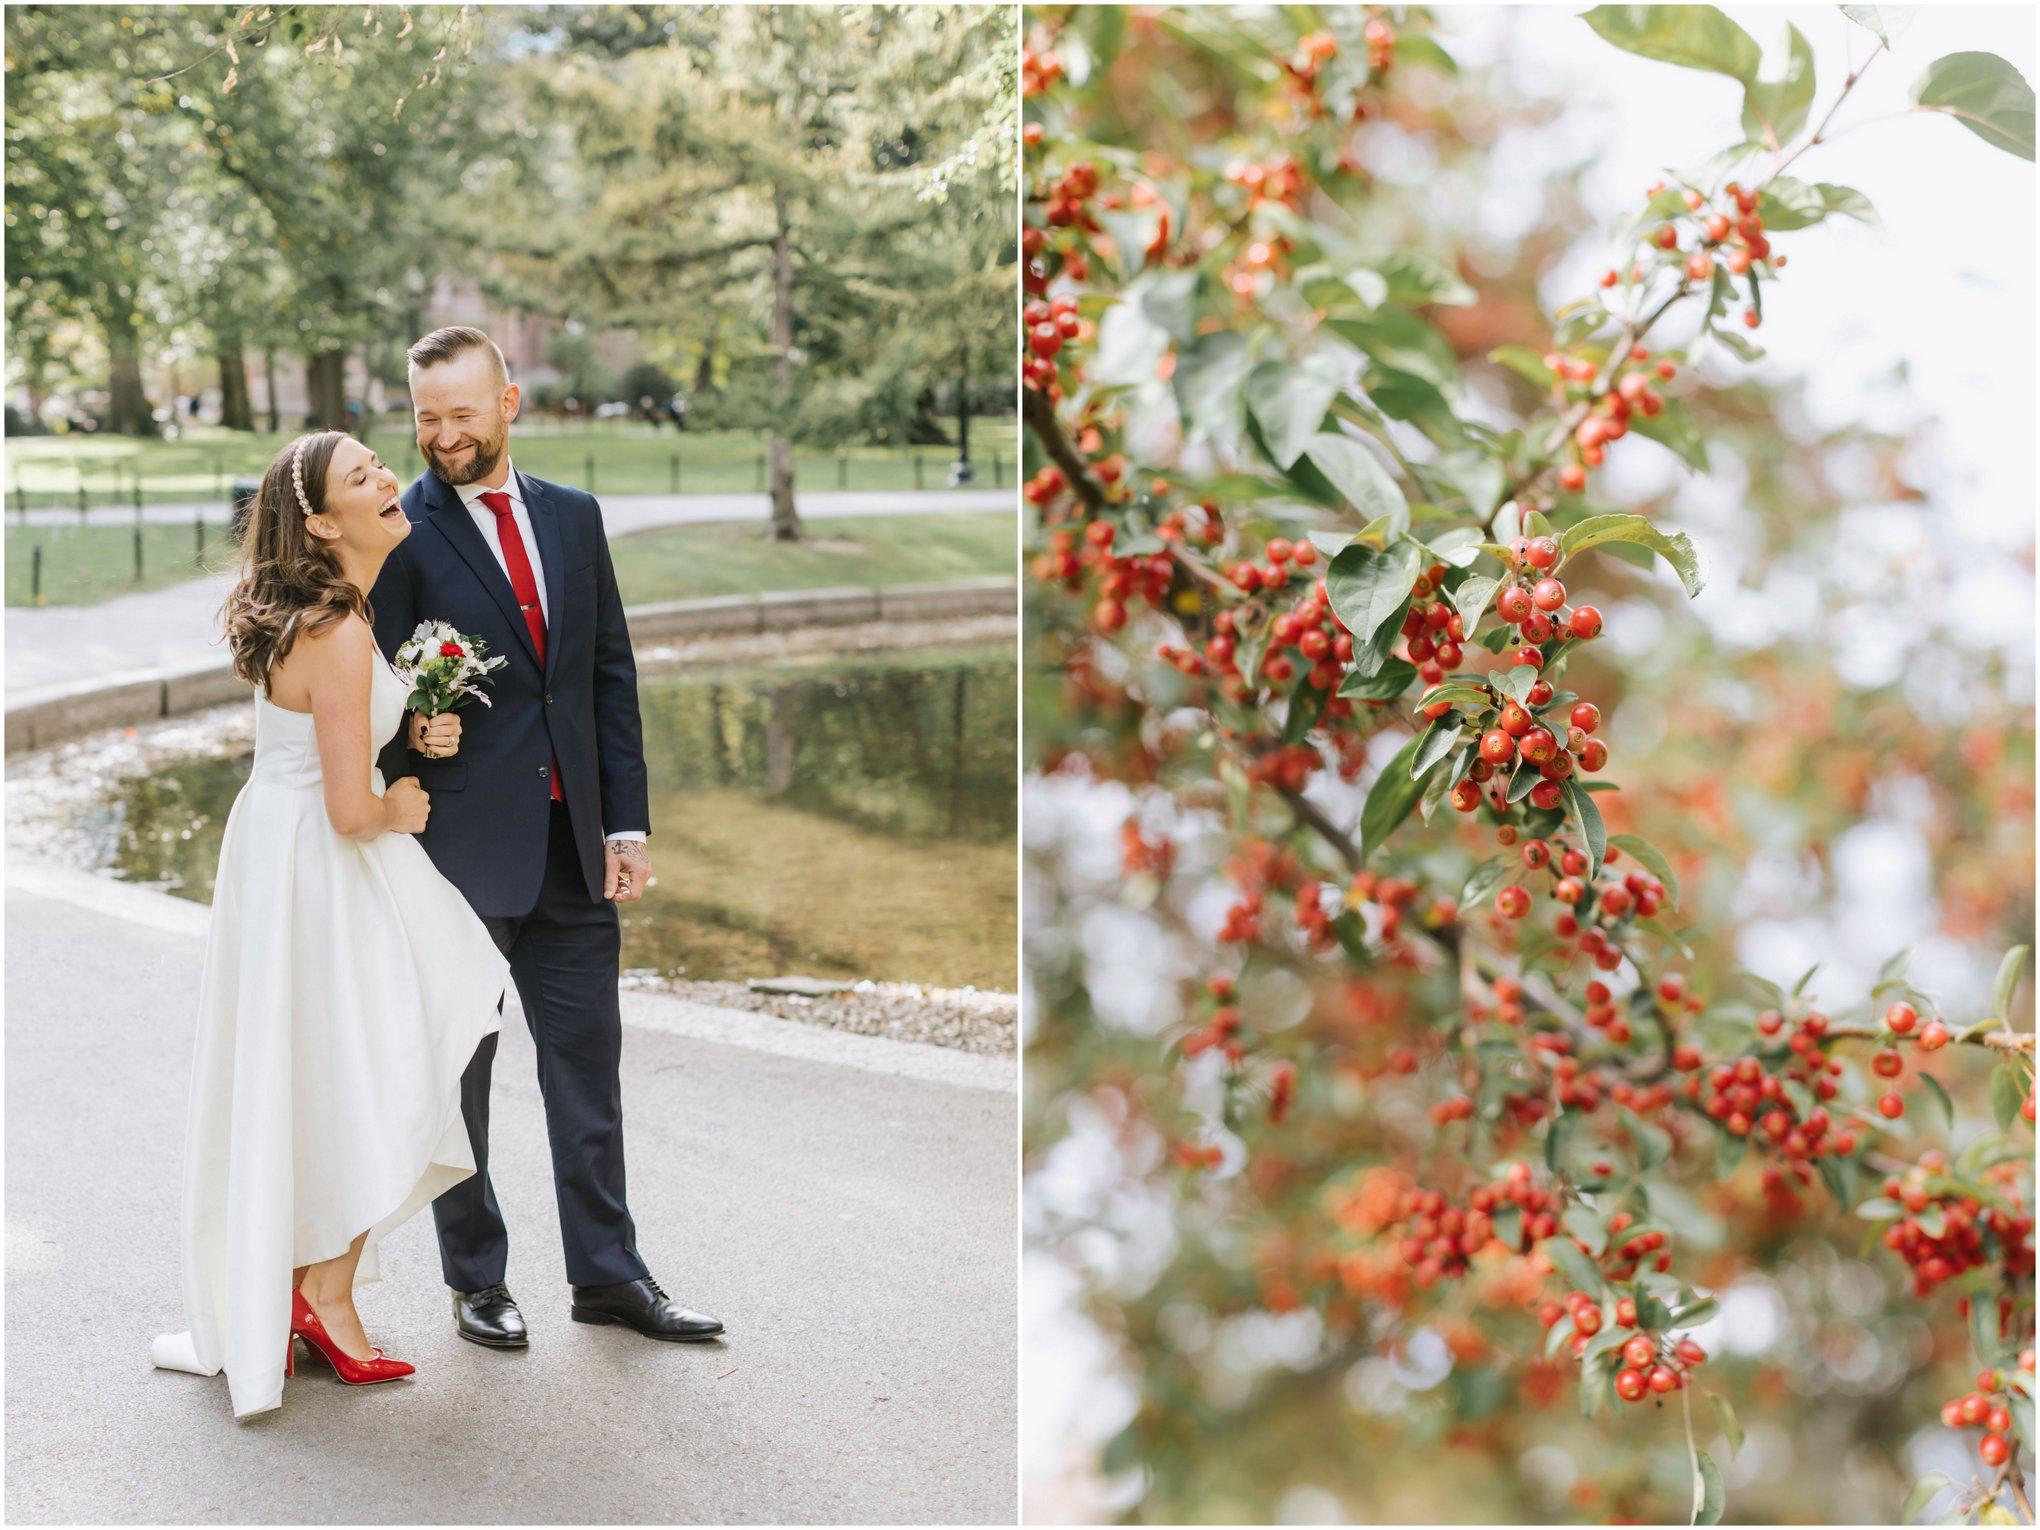 Boston-City-Hall-Wedding-Elopement-Photographer-Lena-Mirisola-14.JPG